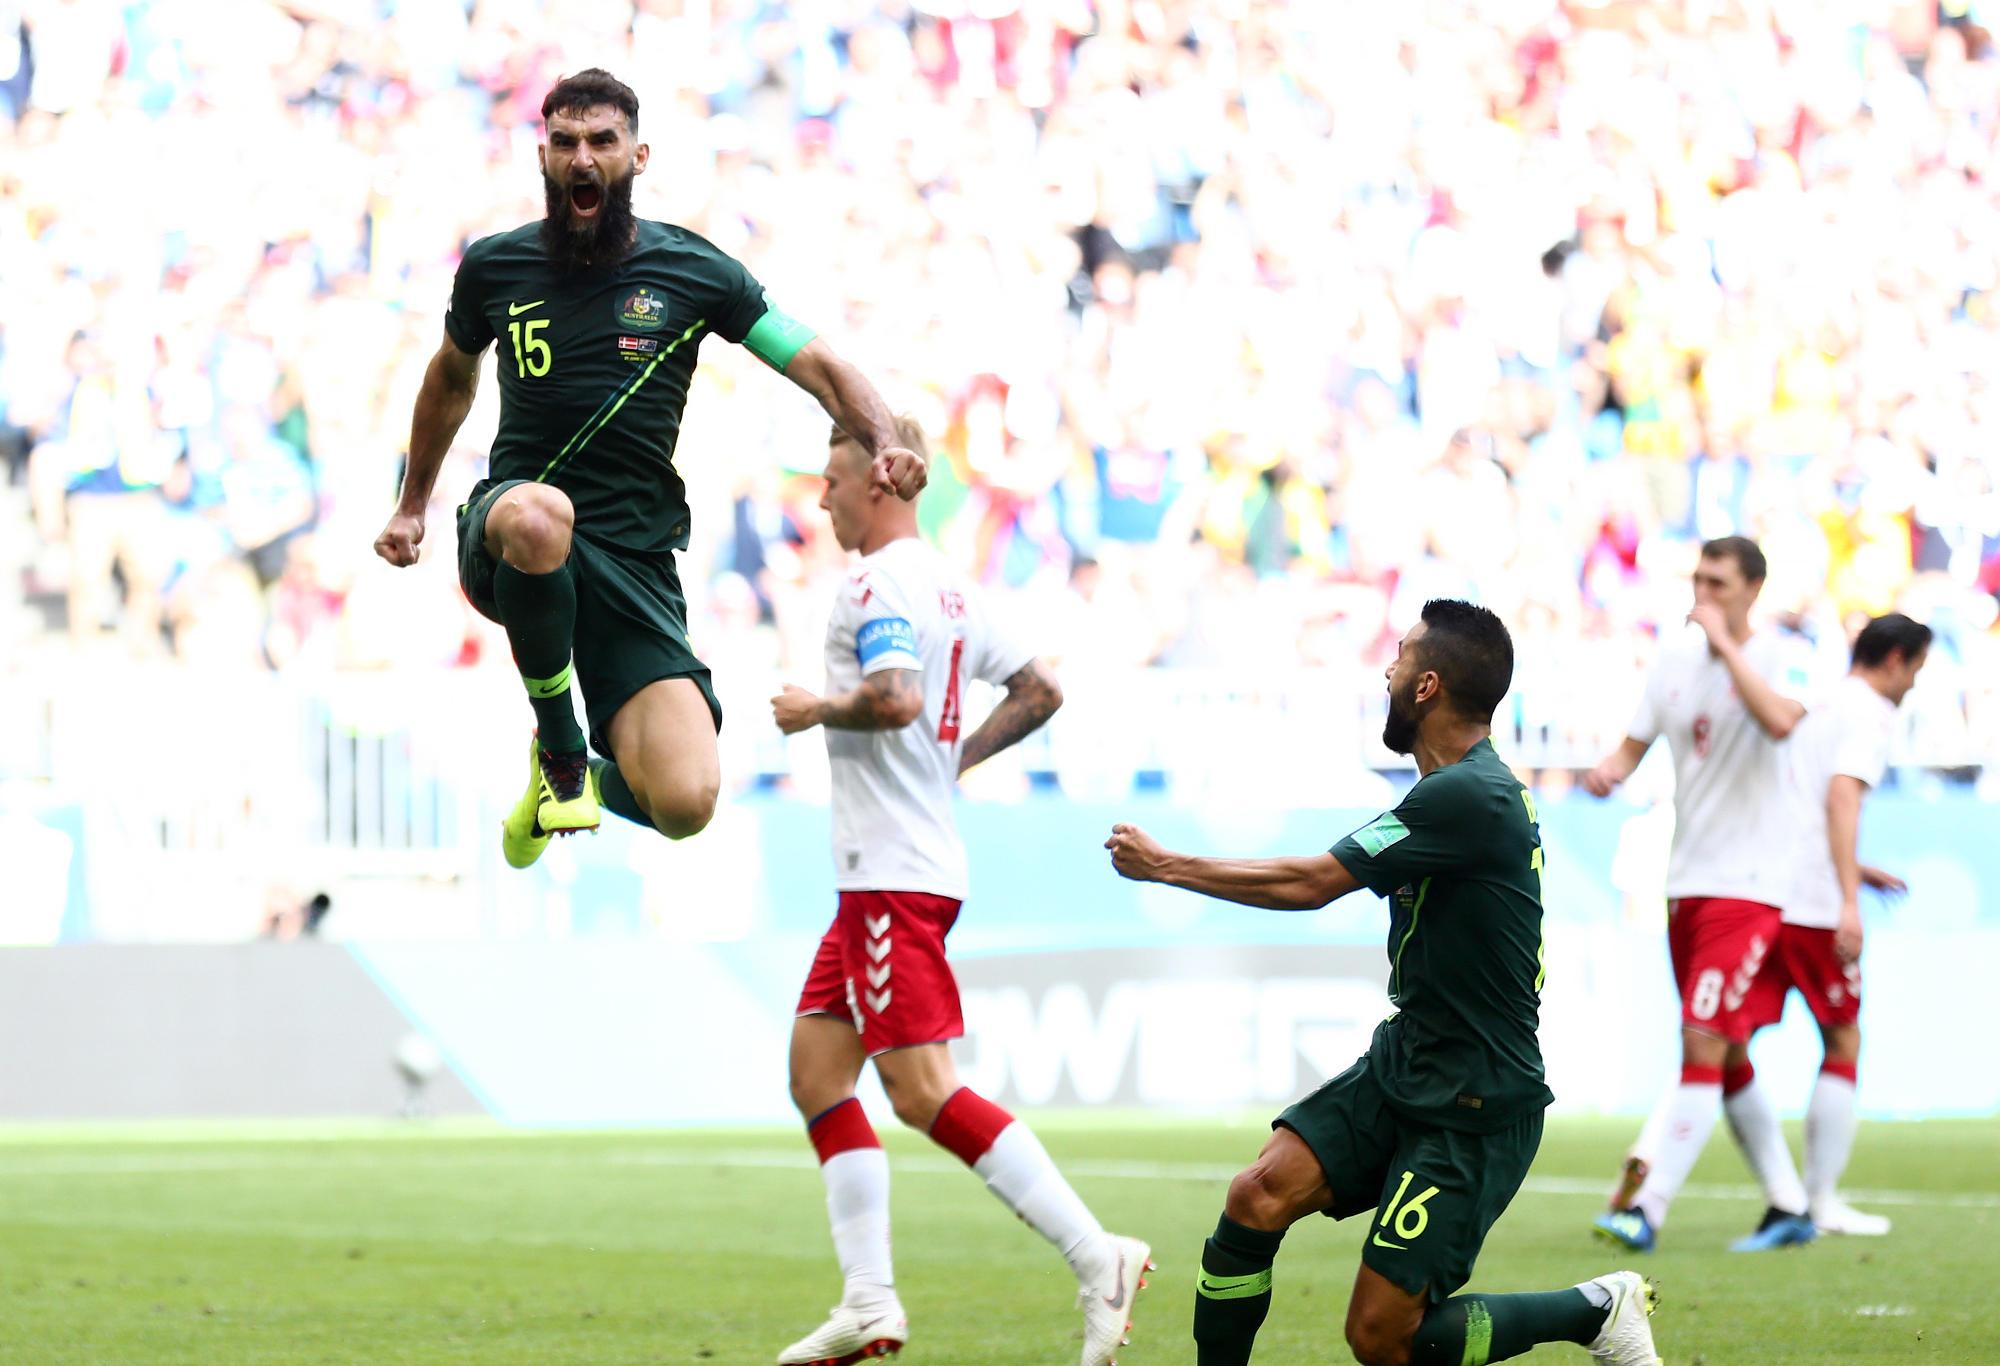 Mile Jedinak celebrates after scoring for the Socceroos